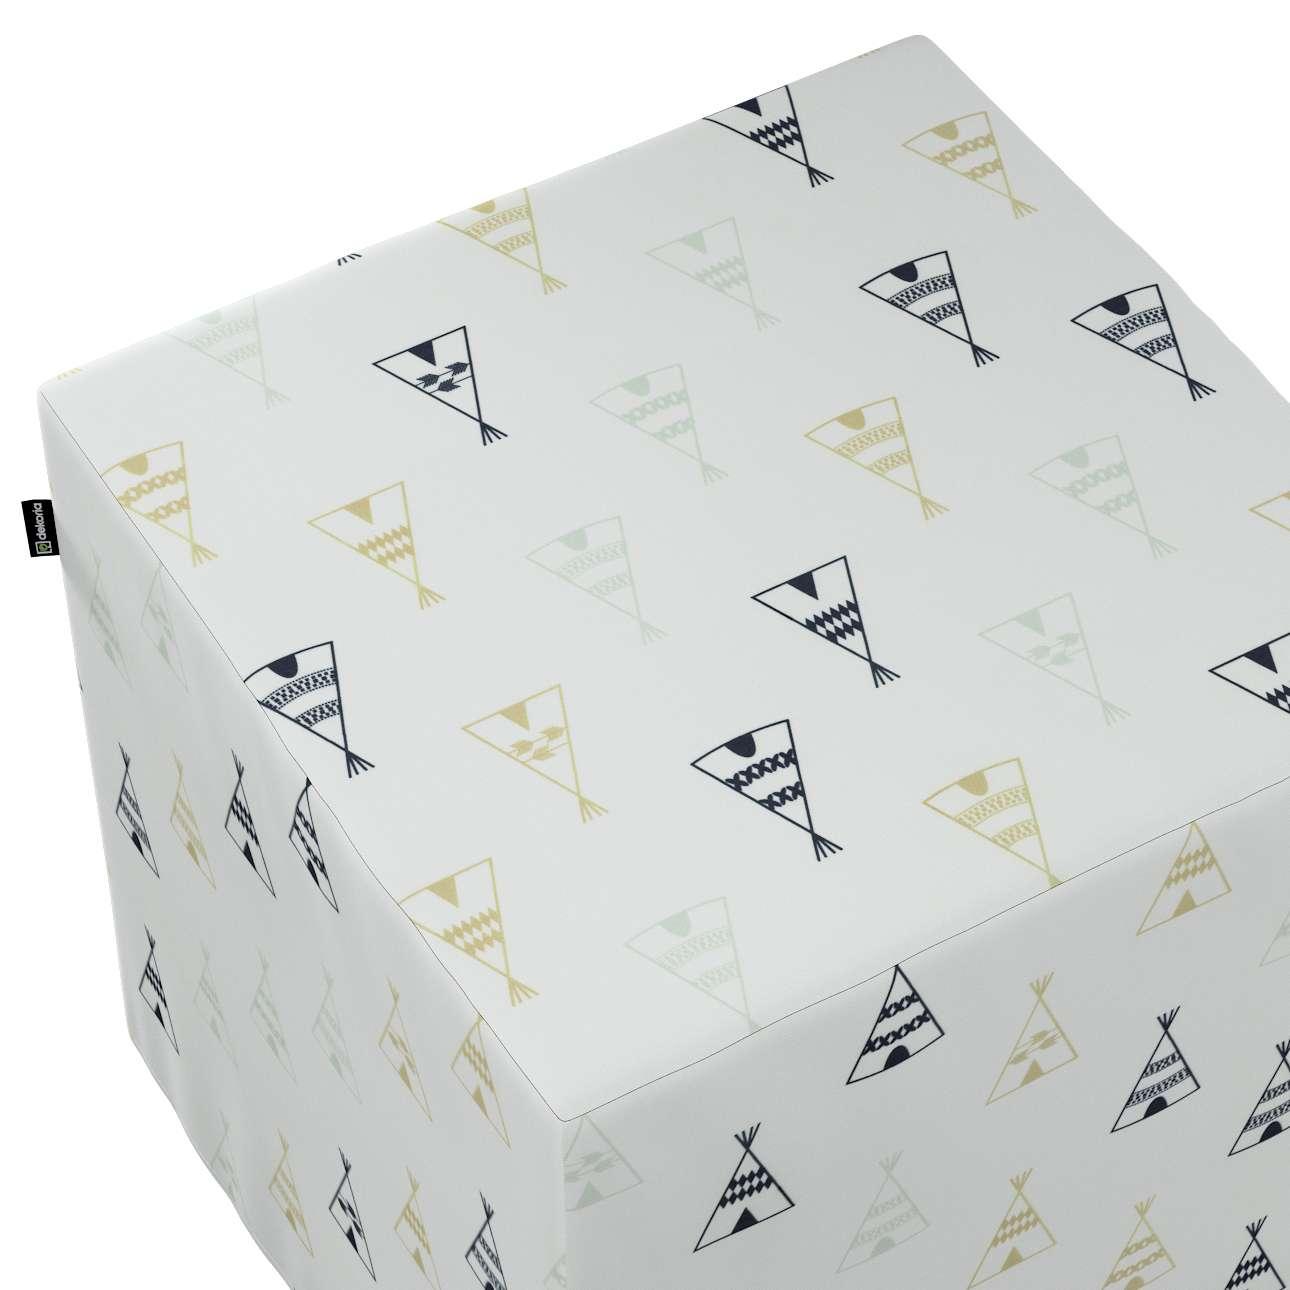 Taburetka tvrdá, kocka V kolekcii Adventure, tkanina: 141-84